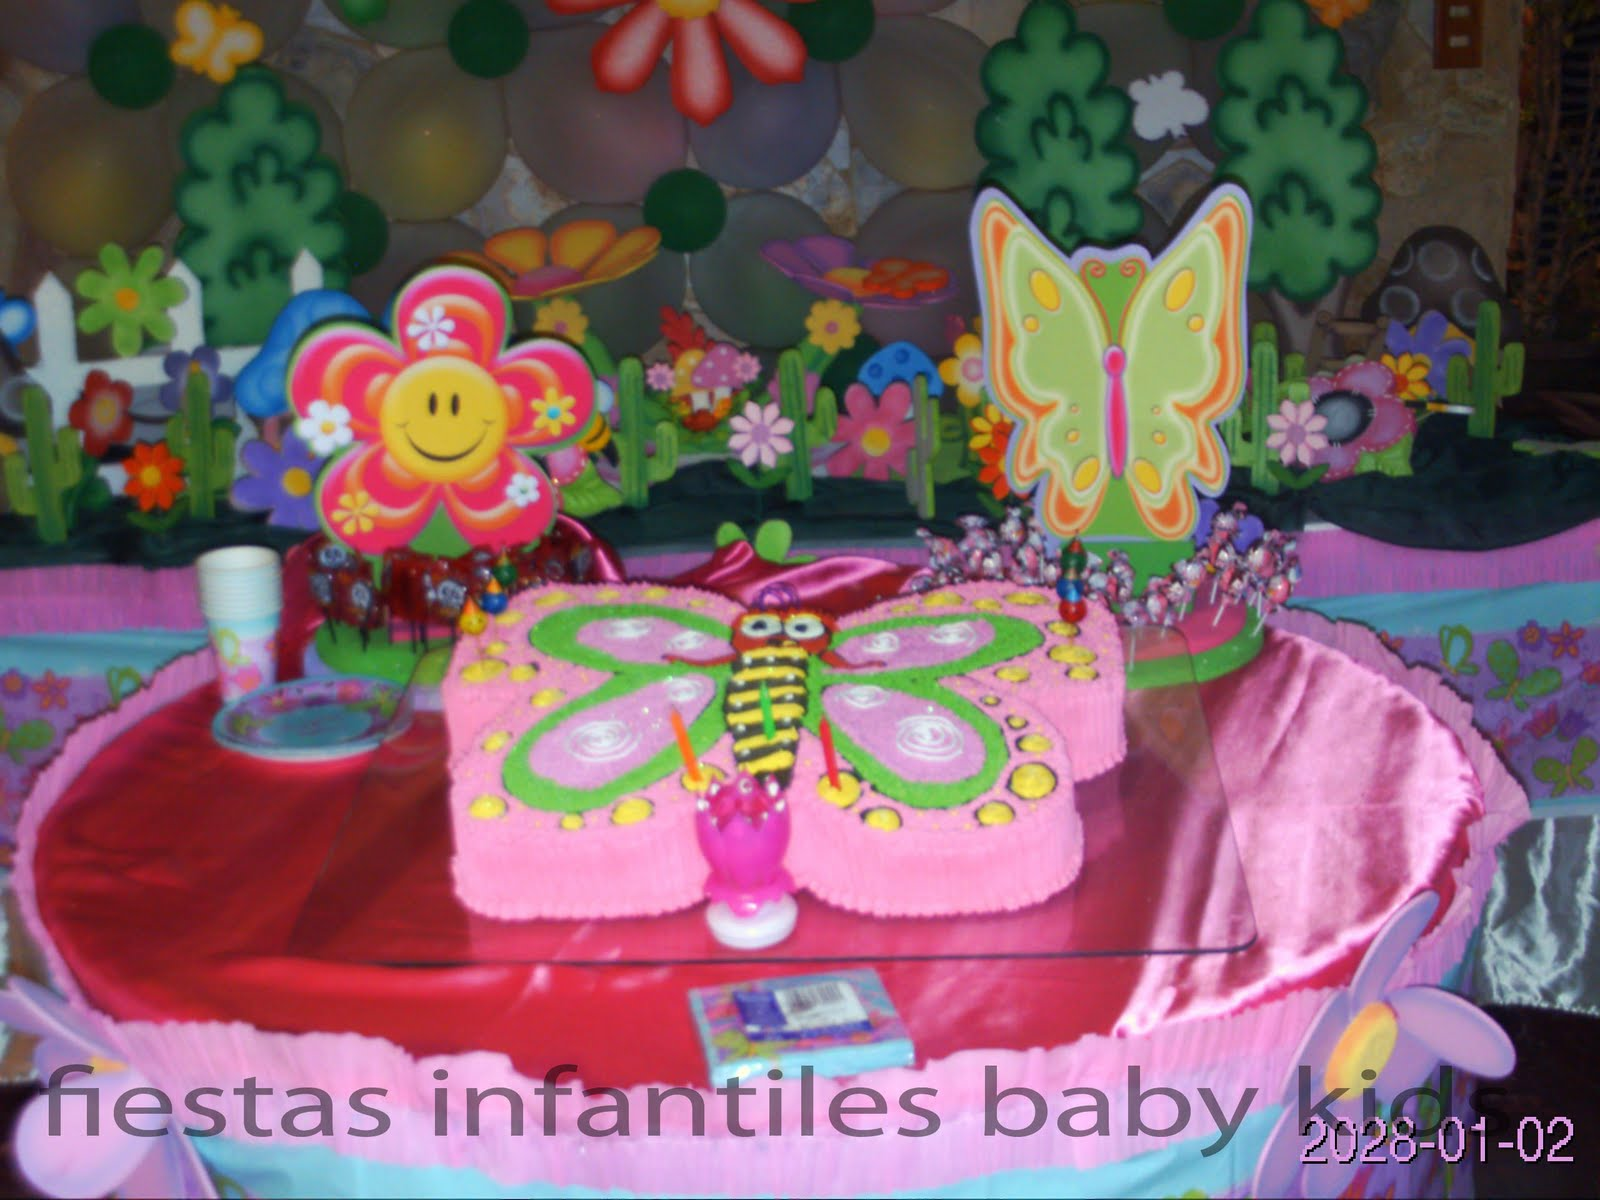 Decoracion fiesta de mariposas auto design tech - Decoracion de fiestas infantiles ...